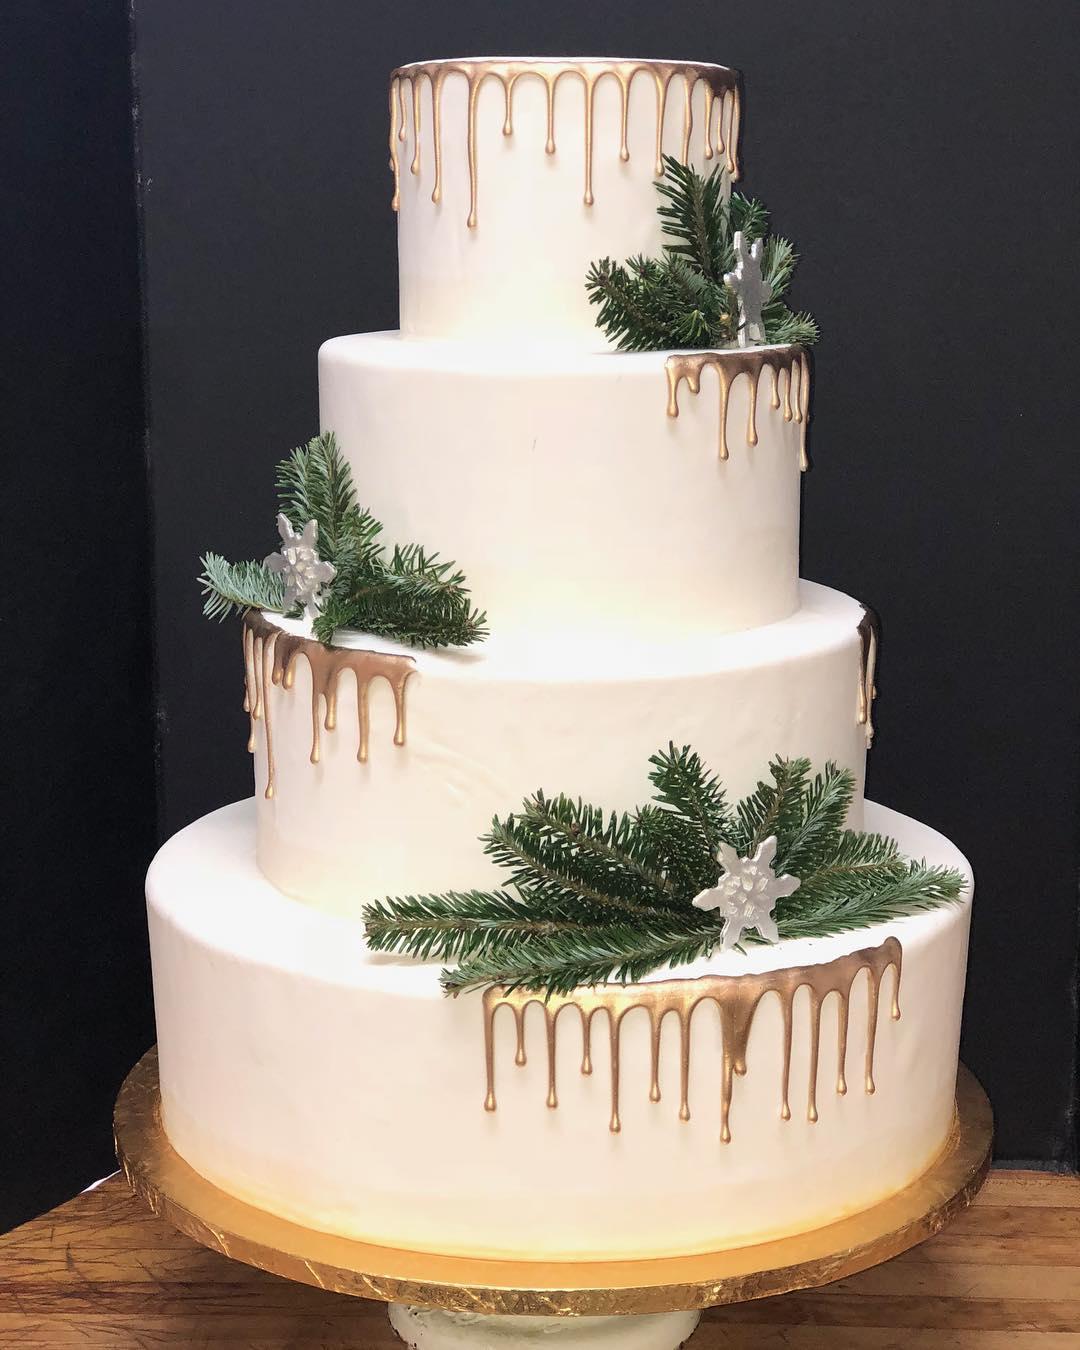 🎶Silver and Gold 🎶 #weddingcake #cakestagram #cakesofinstagram #golddrip #silverandgold